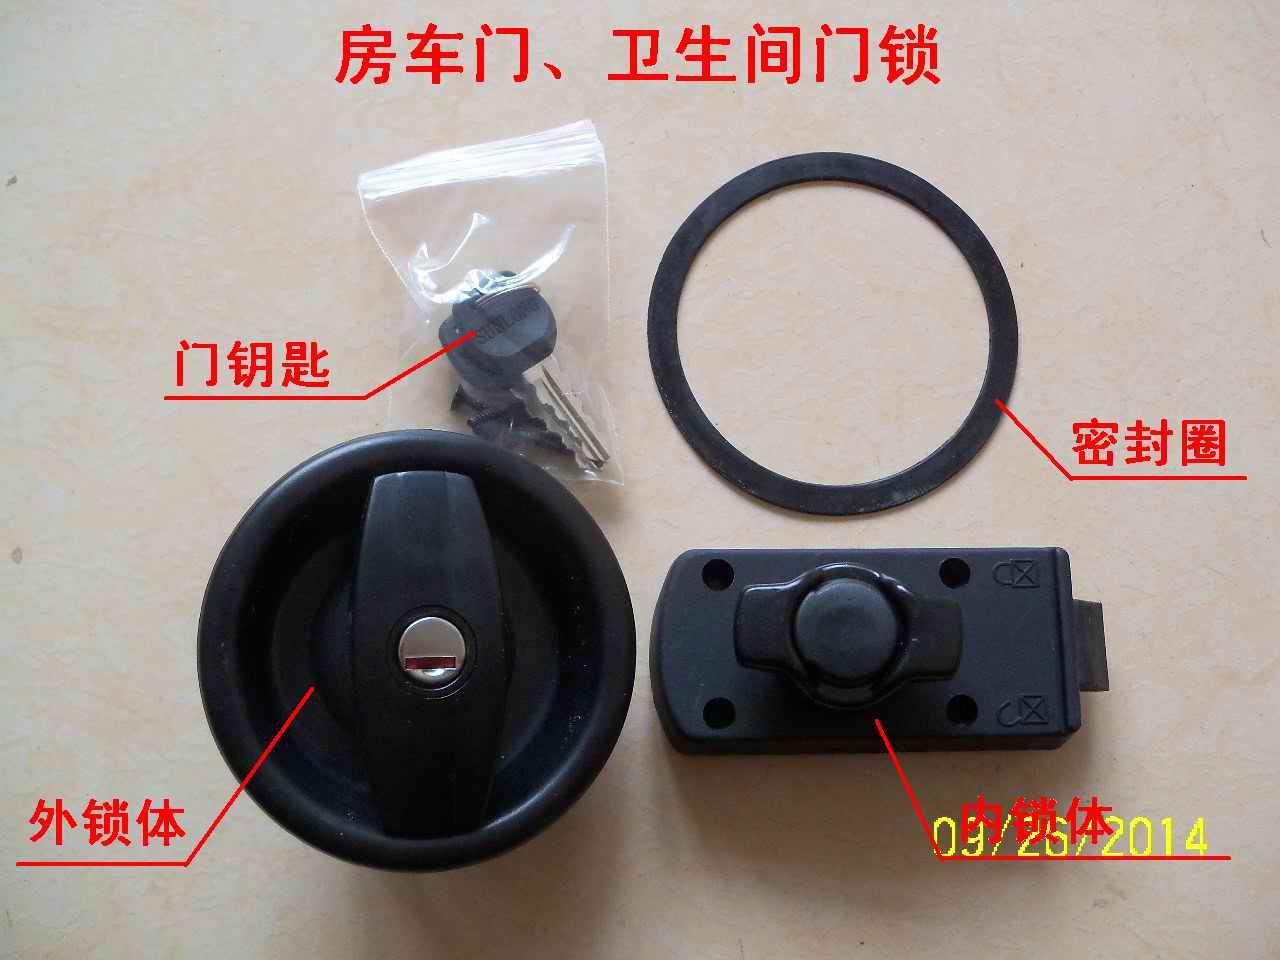 RV locks, toilet locks, RV accessories, RV retrofit, RV parts.